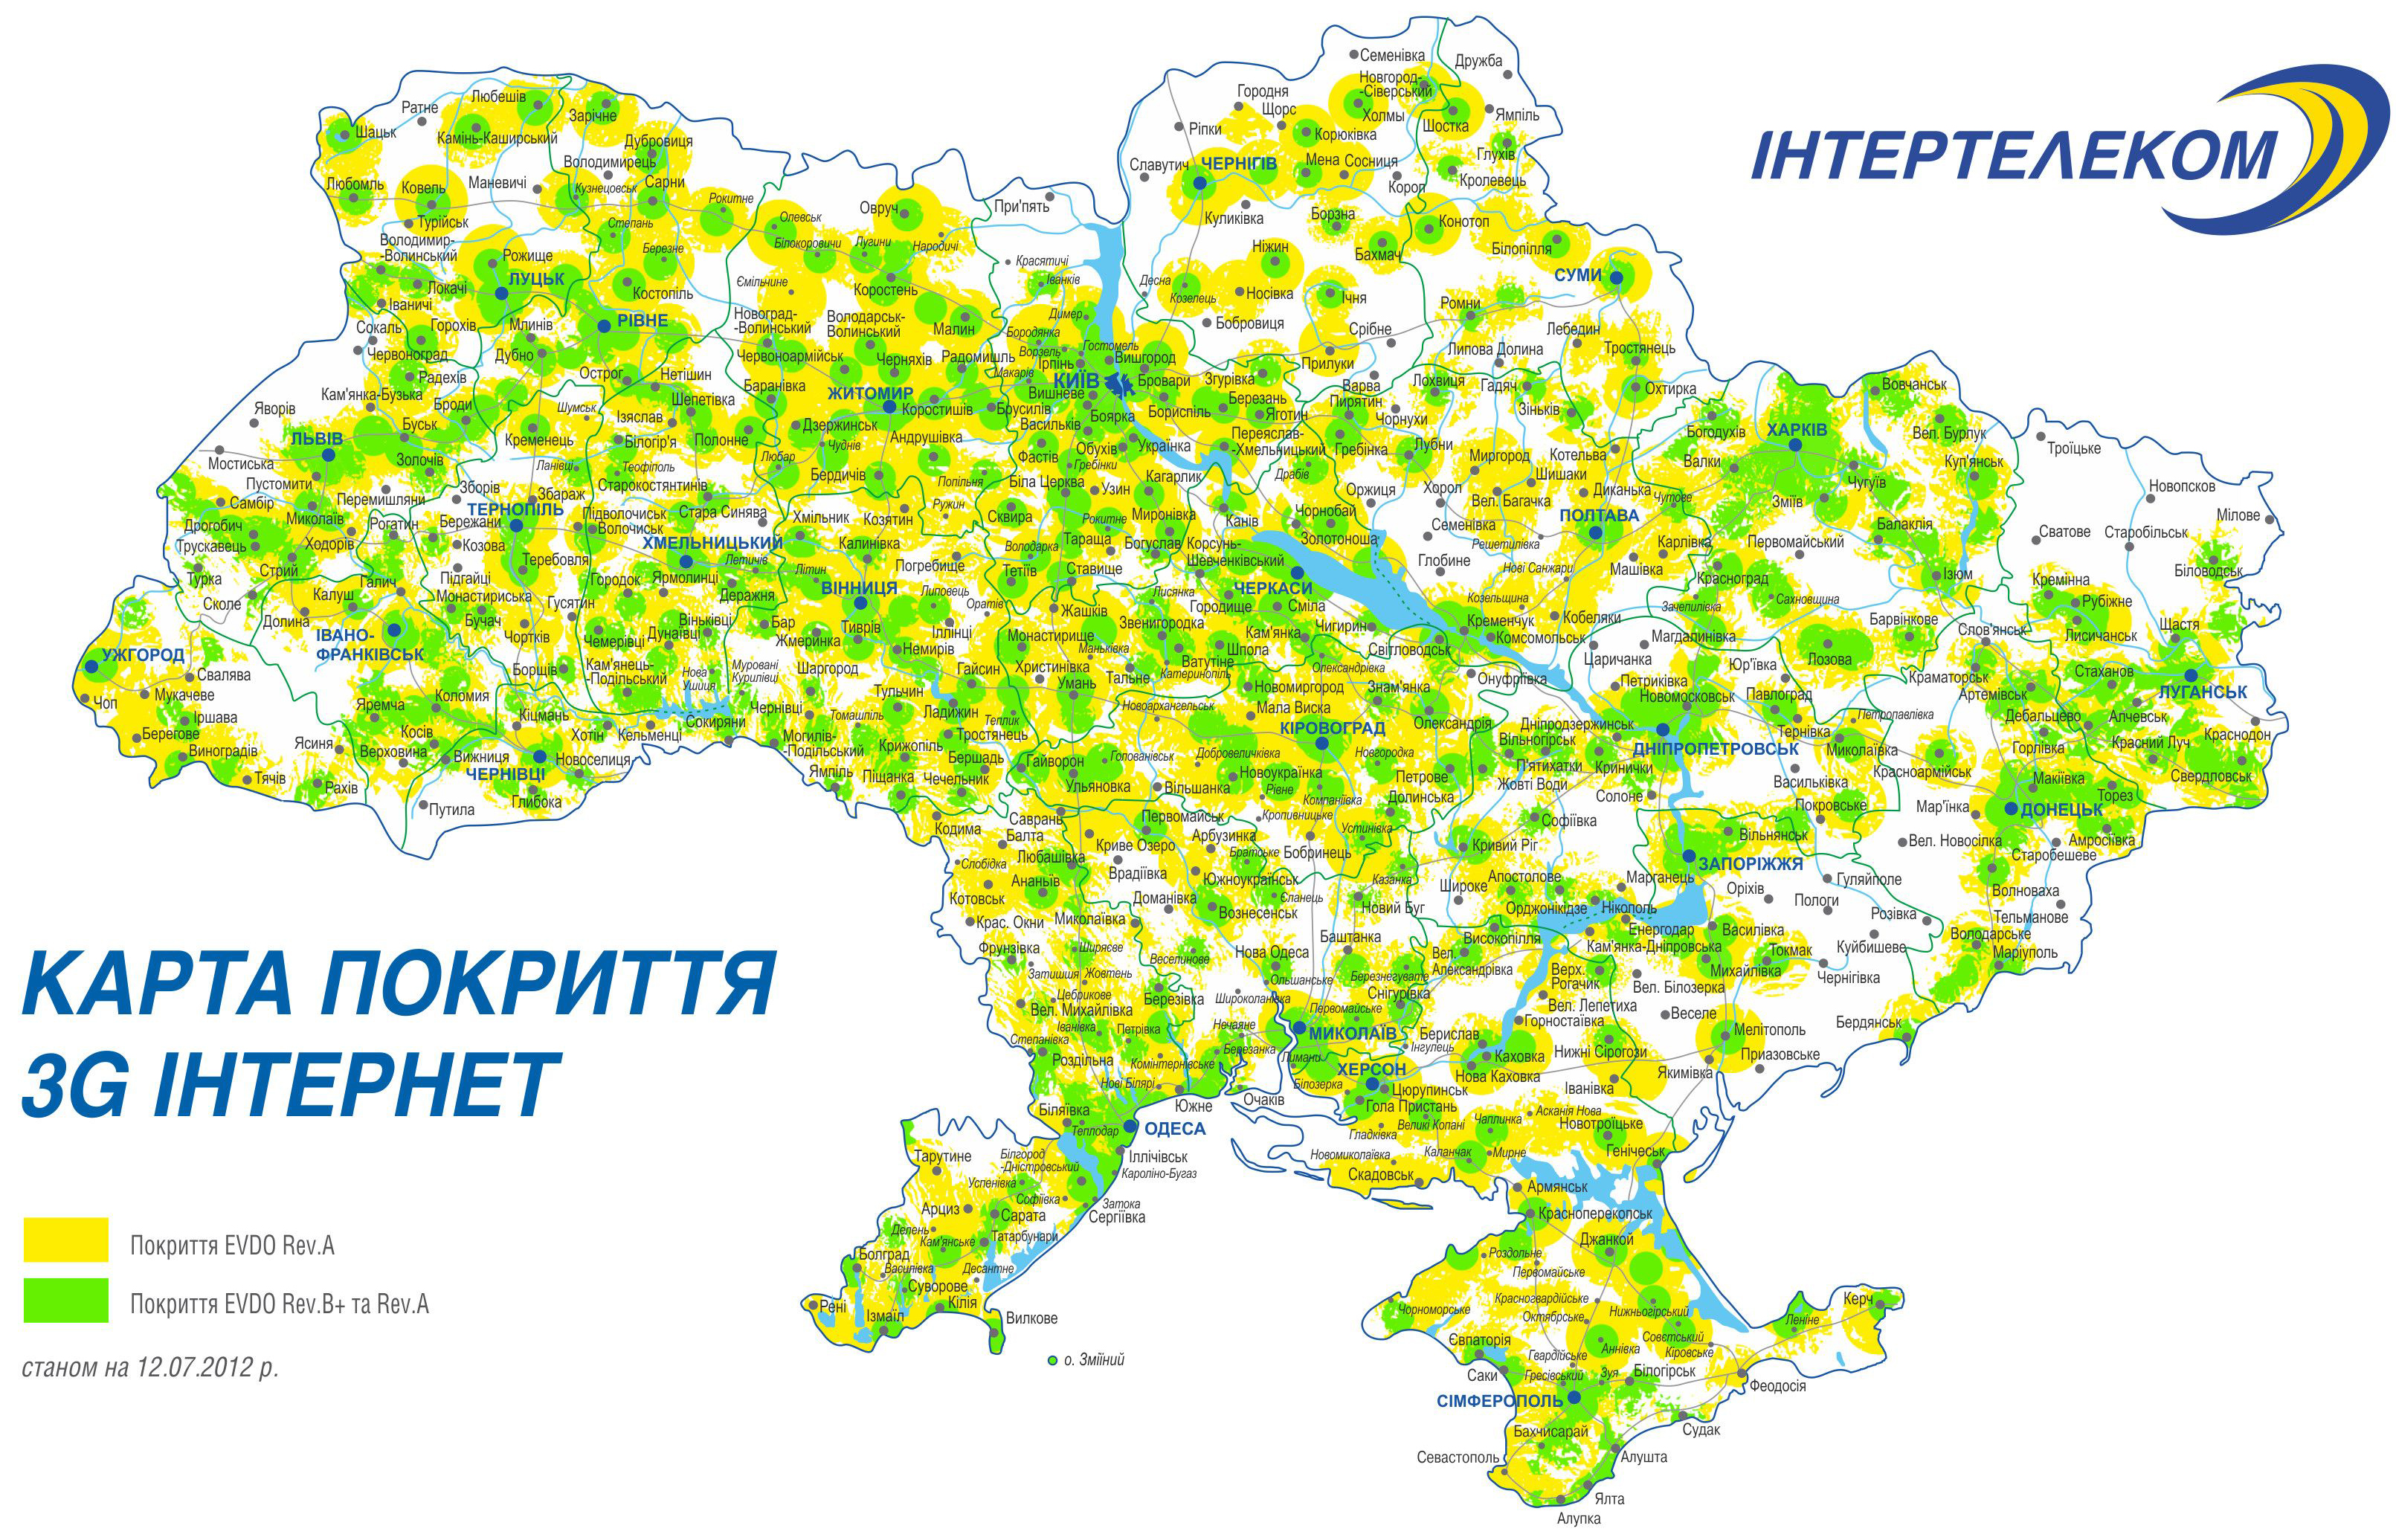 Карта Интертелеком покрытие 3G